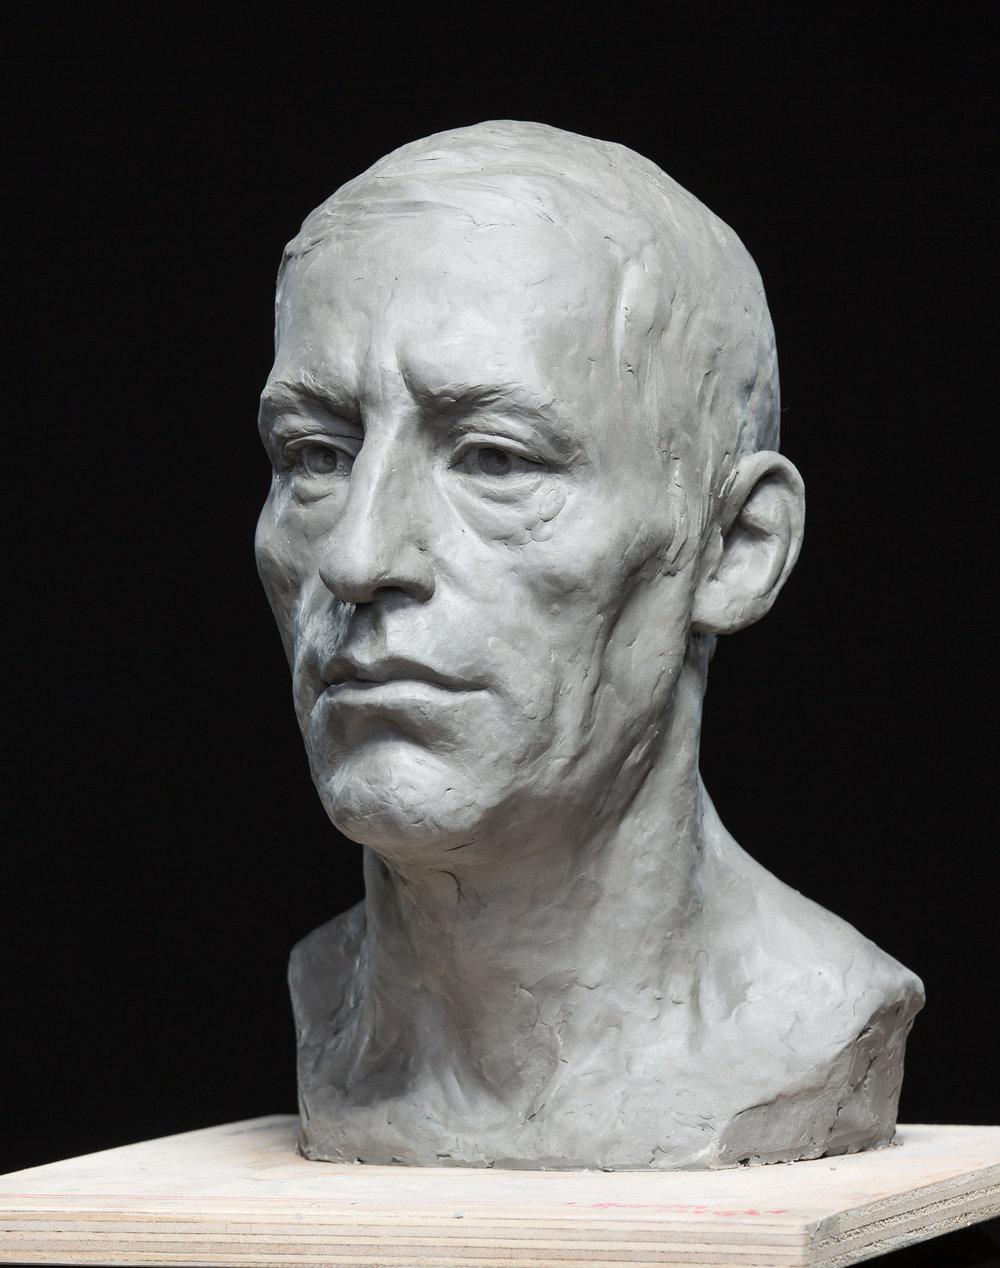 Portrait Study in Clay